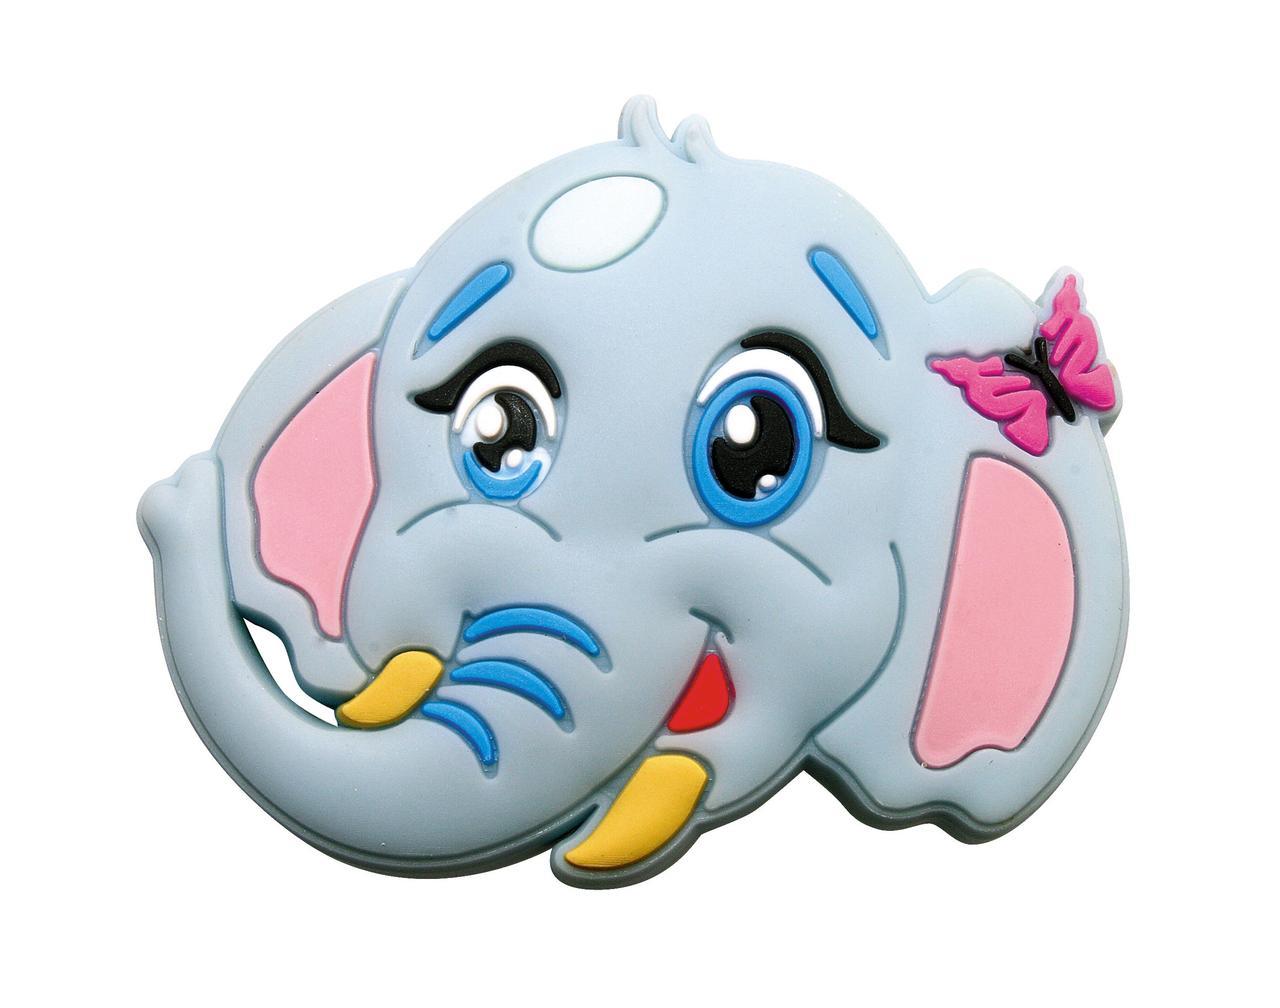 Ручка меблева дитяча GTV UM-KID-P слоненя (UM-KID-P-001)